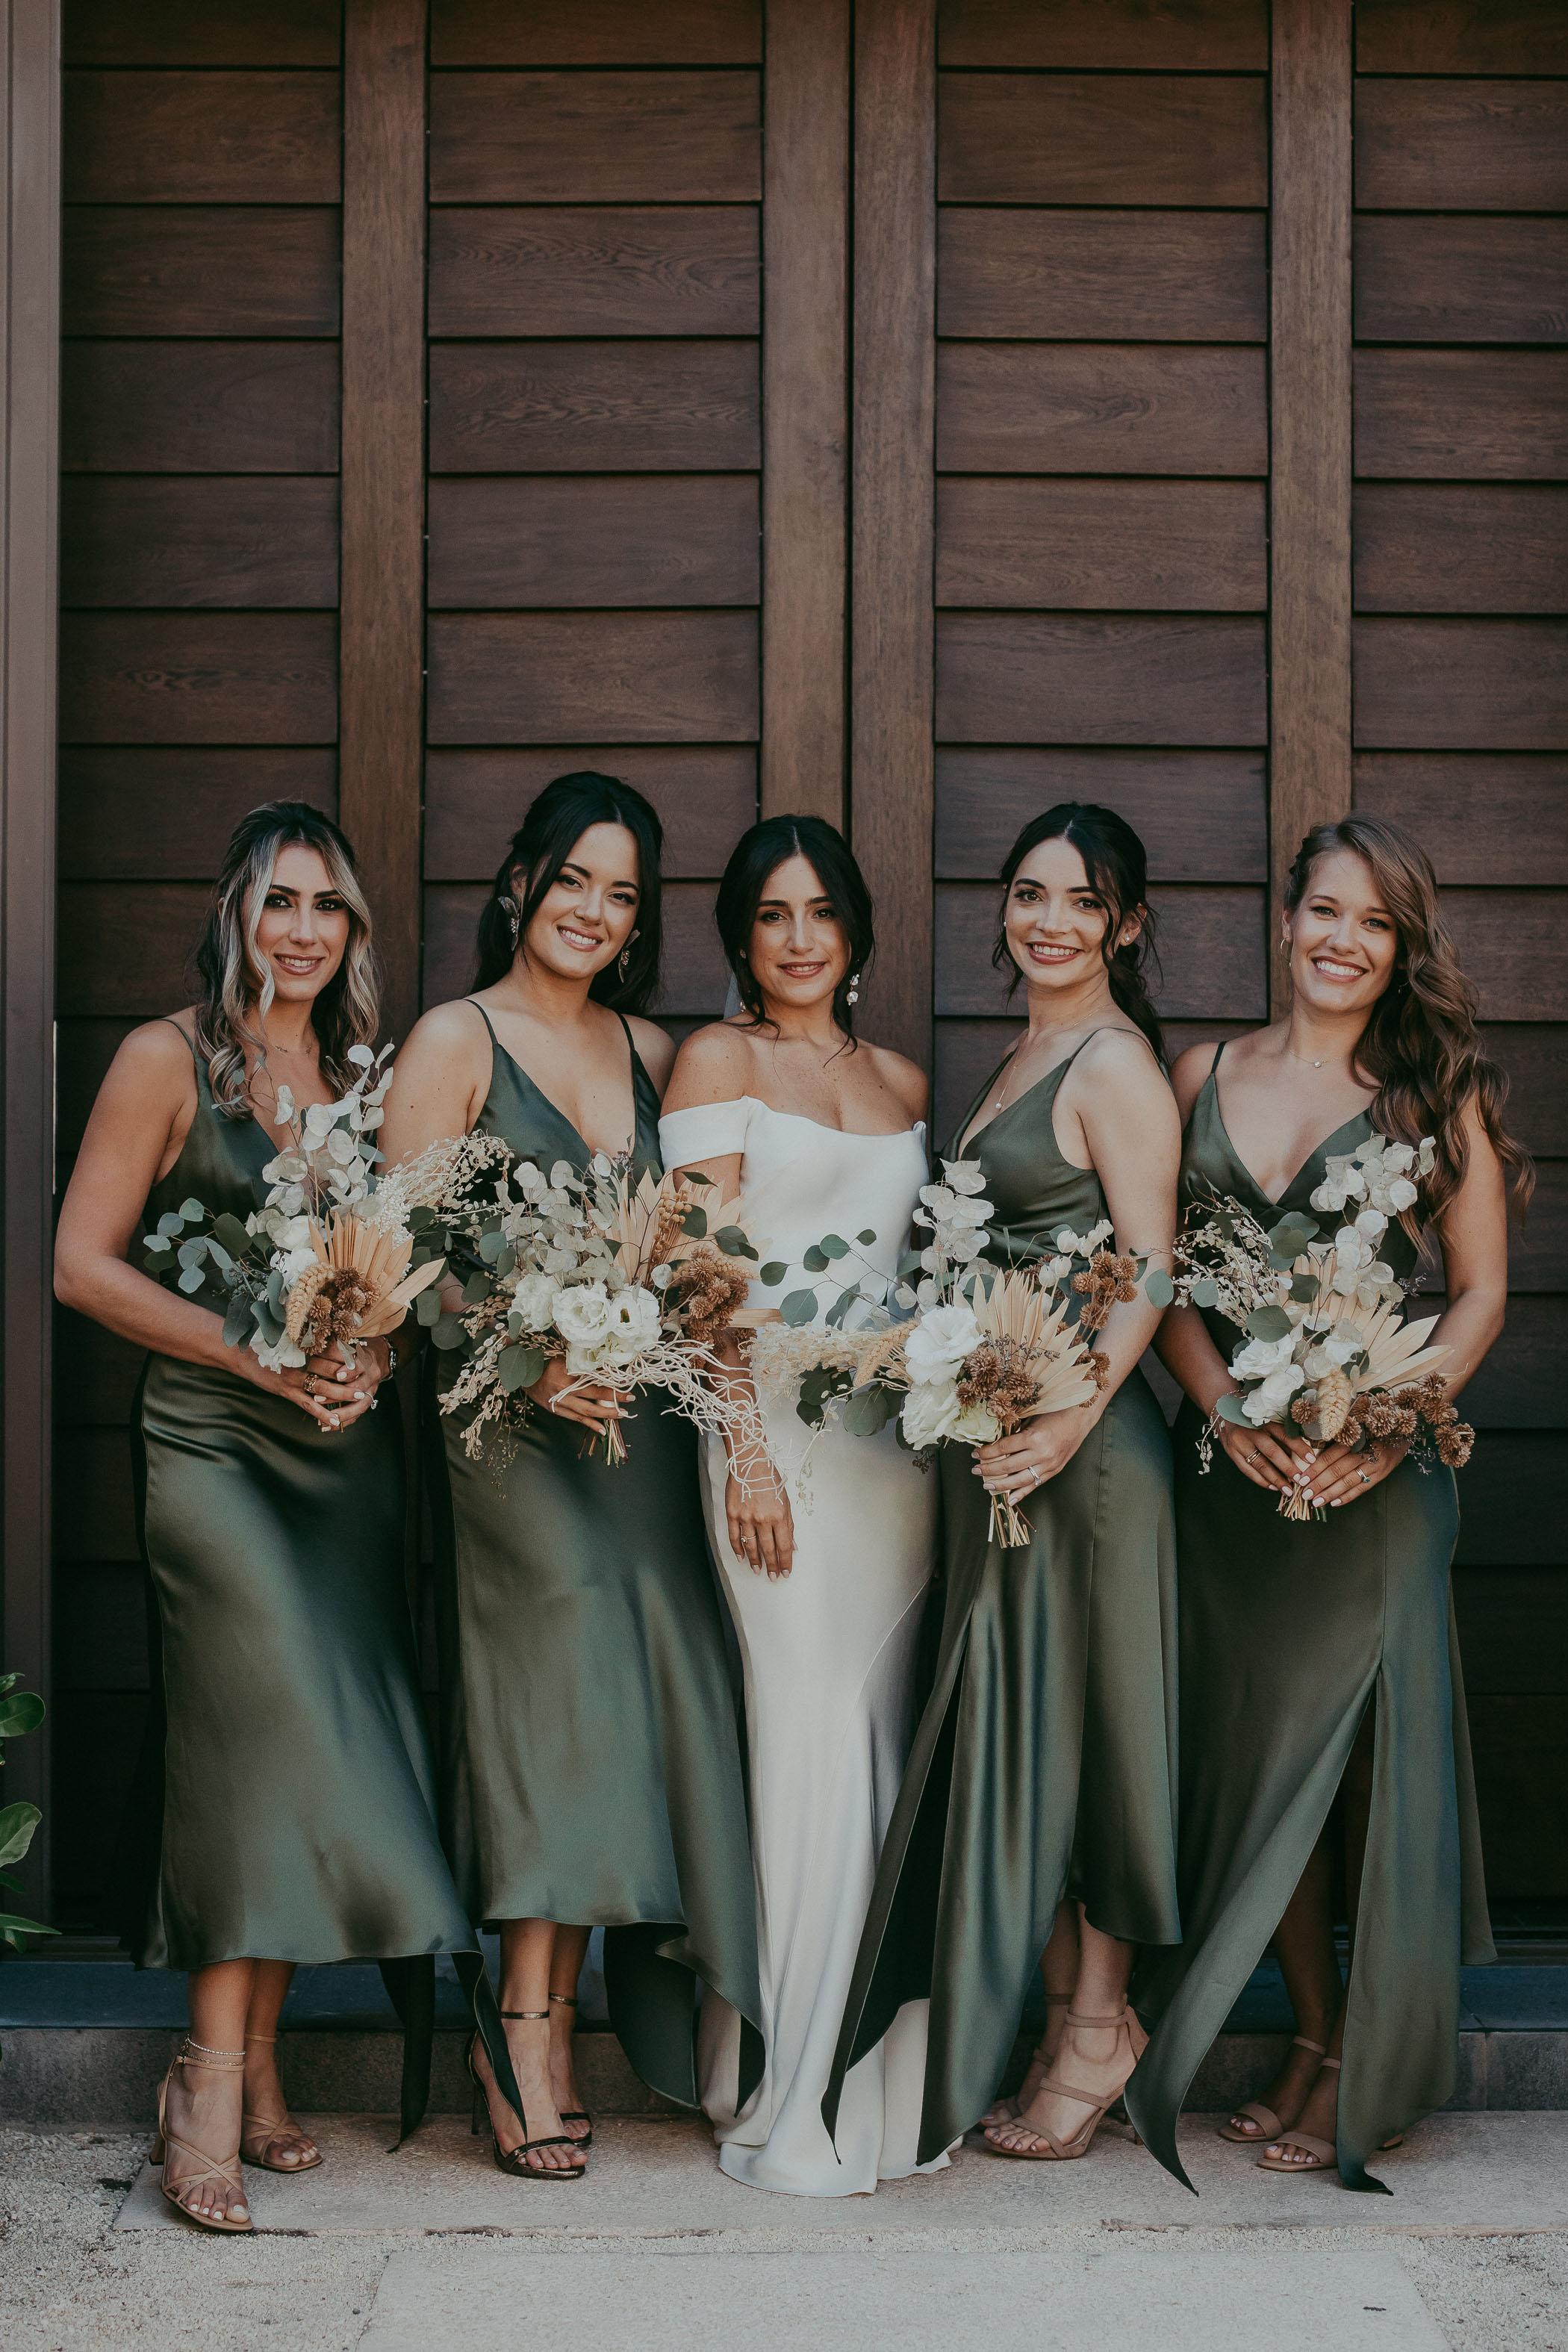 Green Satin Bridesmaid Dresses